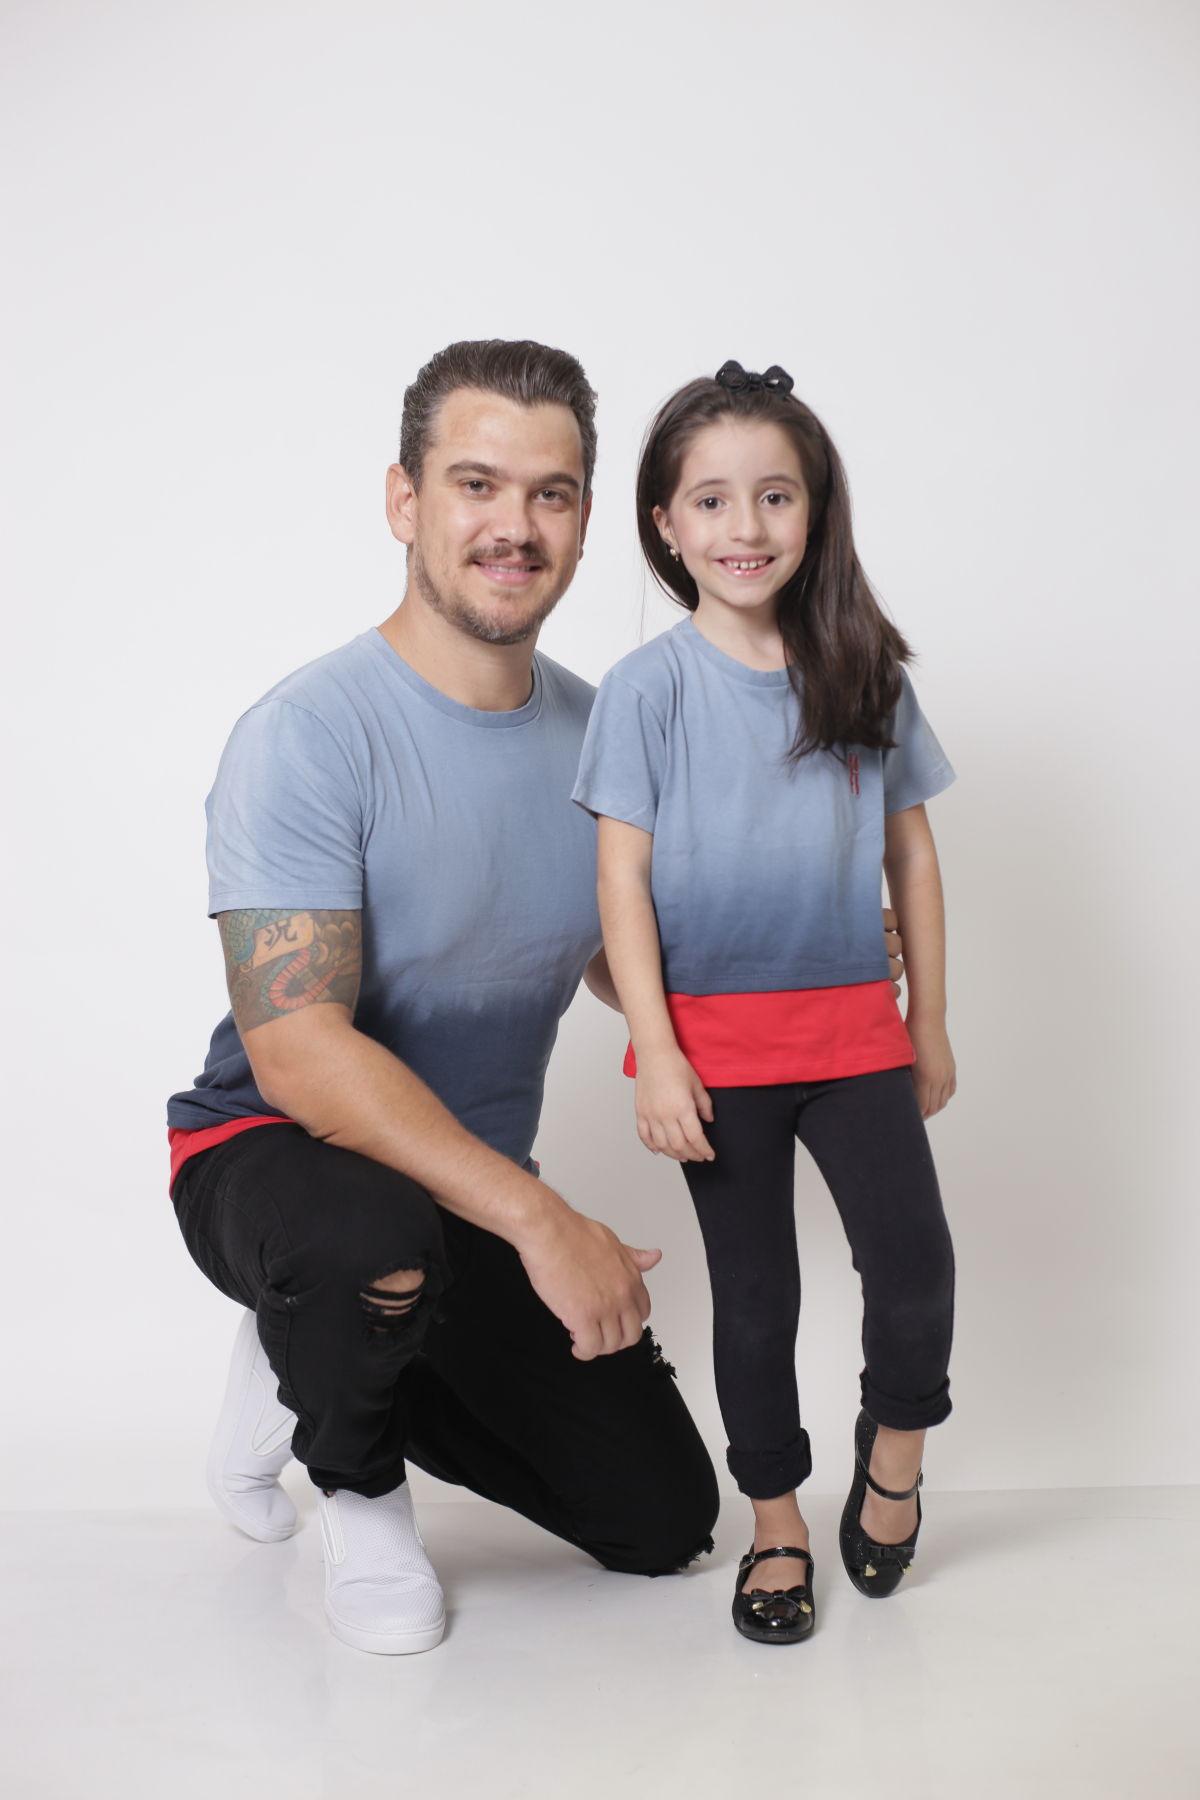 PAI E FILHA > 02 T-Shirts - Degradê  [Coleção Tal Pai Tal Filha]  - Heitor Fashion Brazil